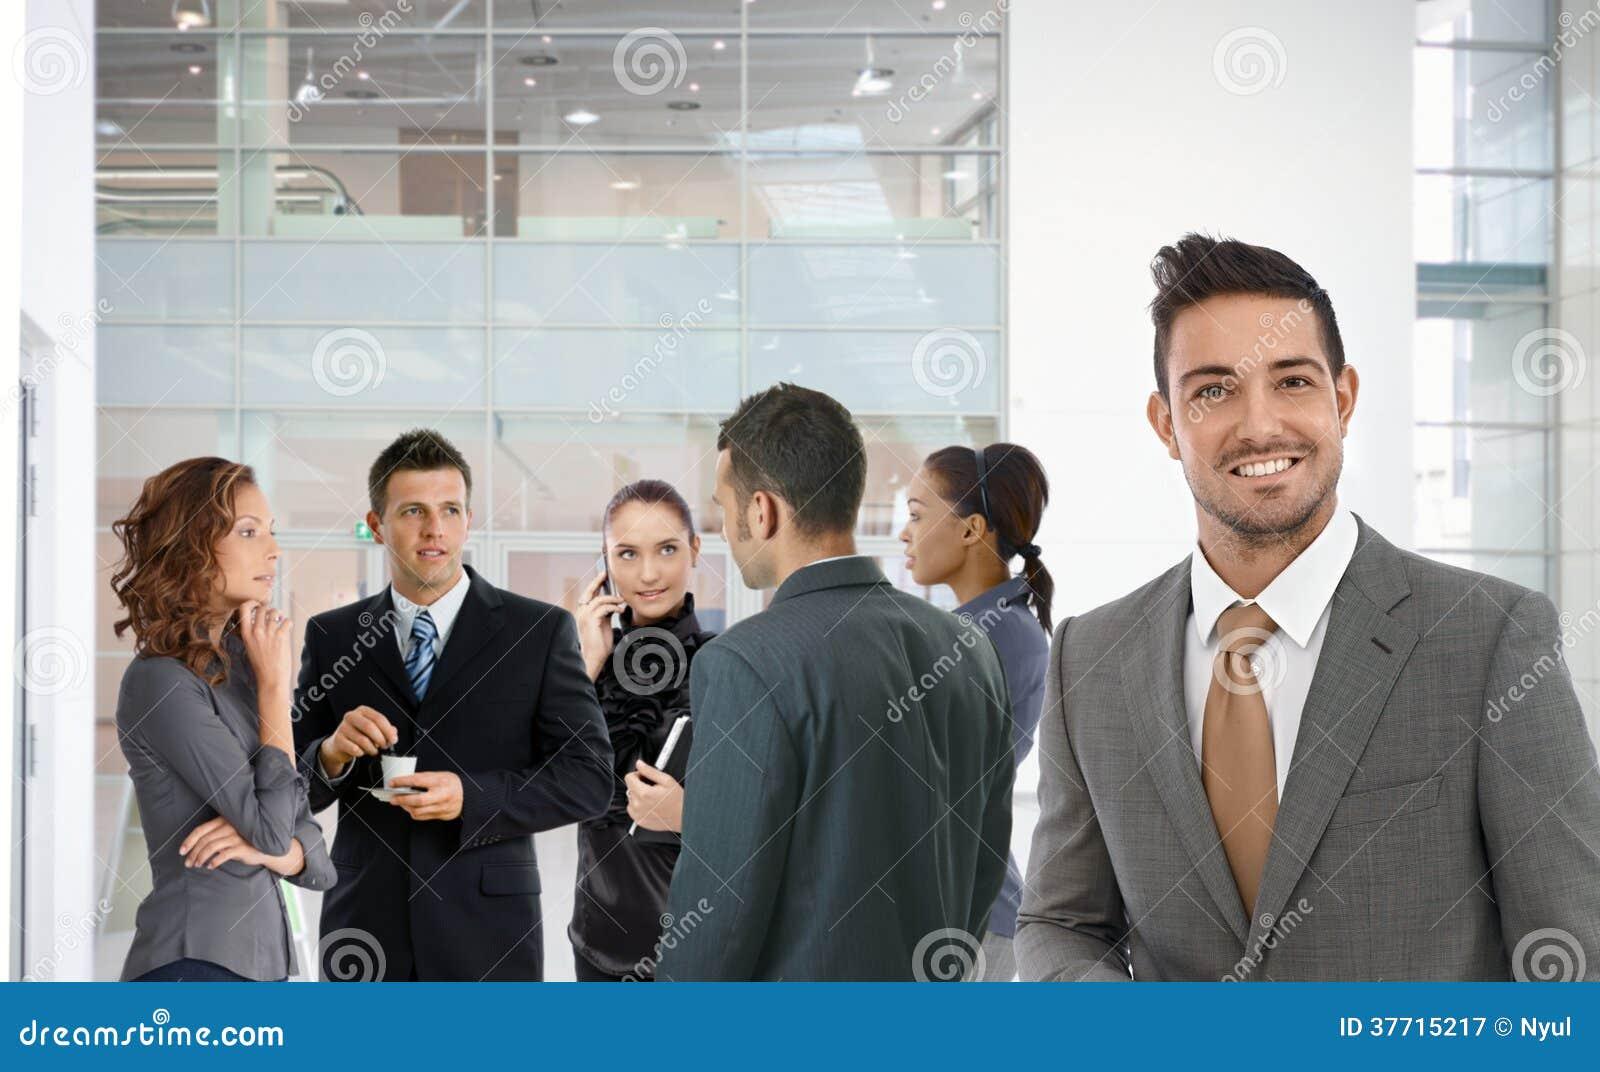 Portrait of successful businessman smiling happy